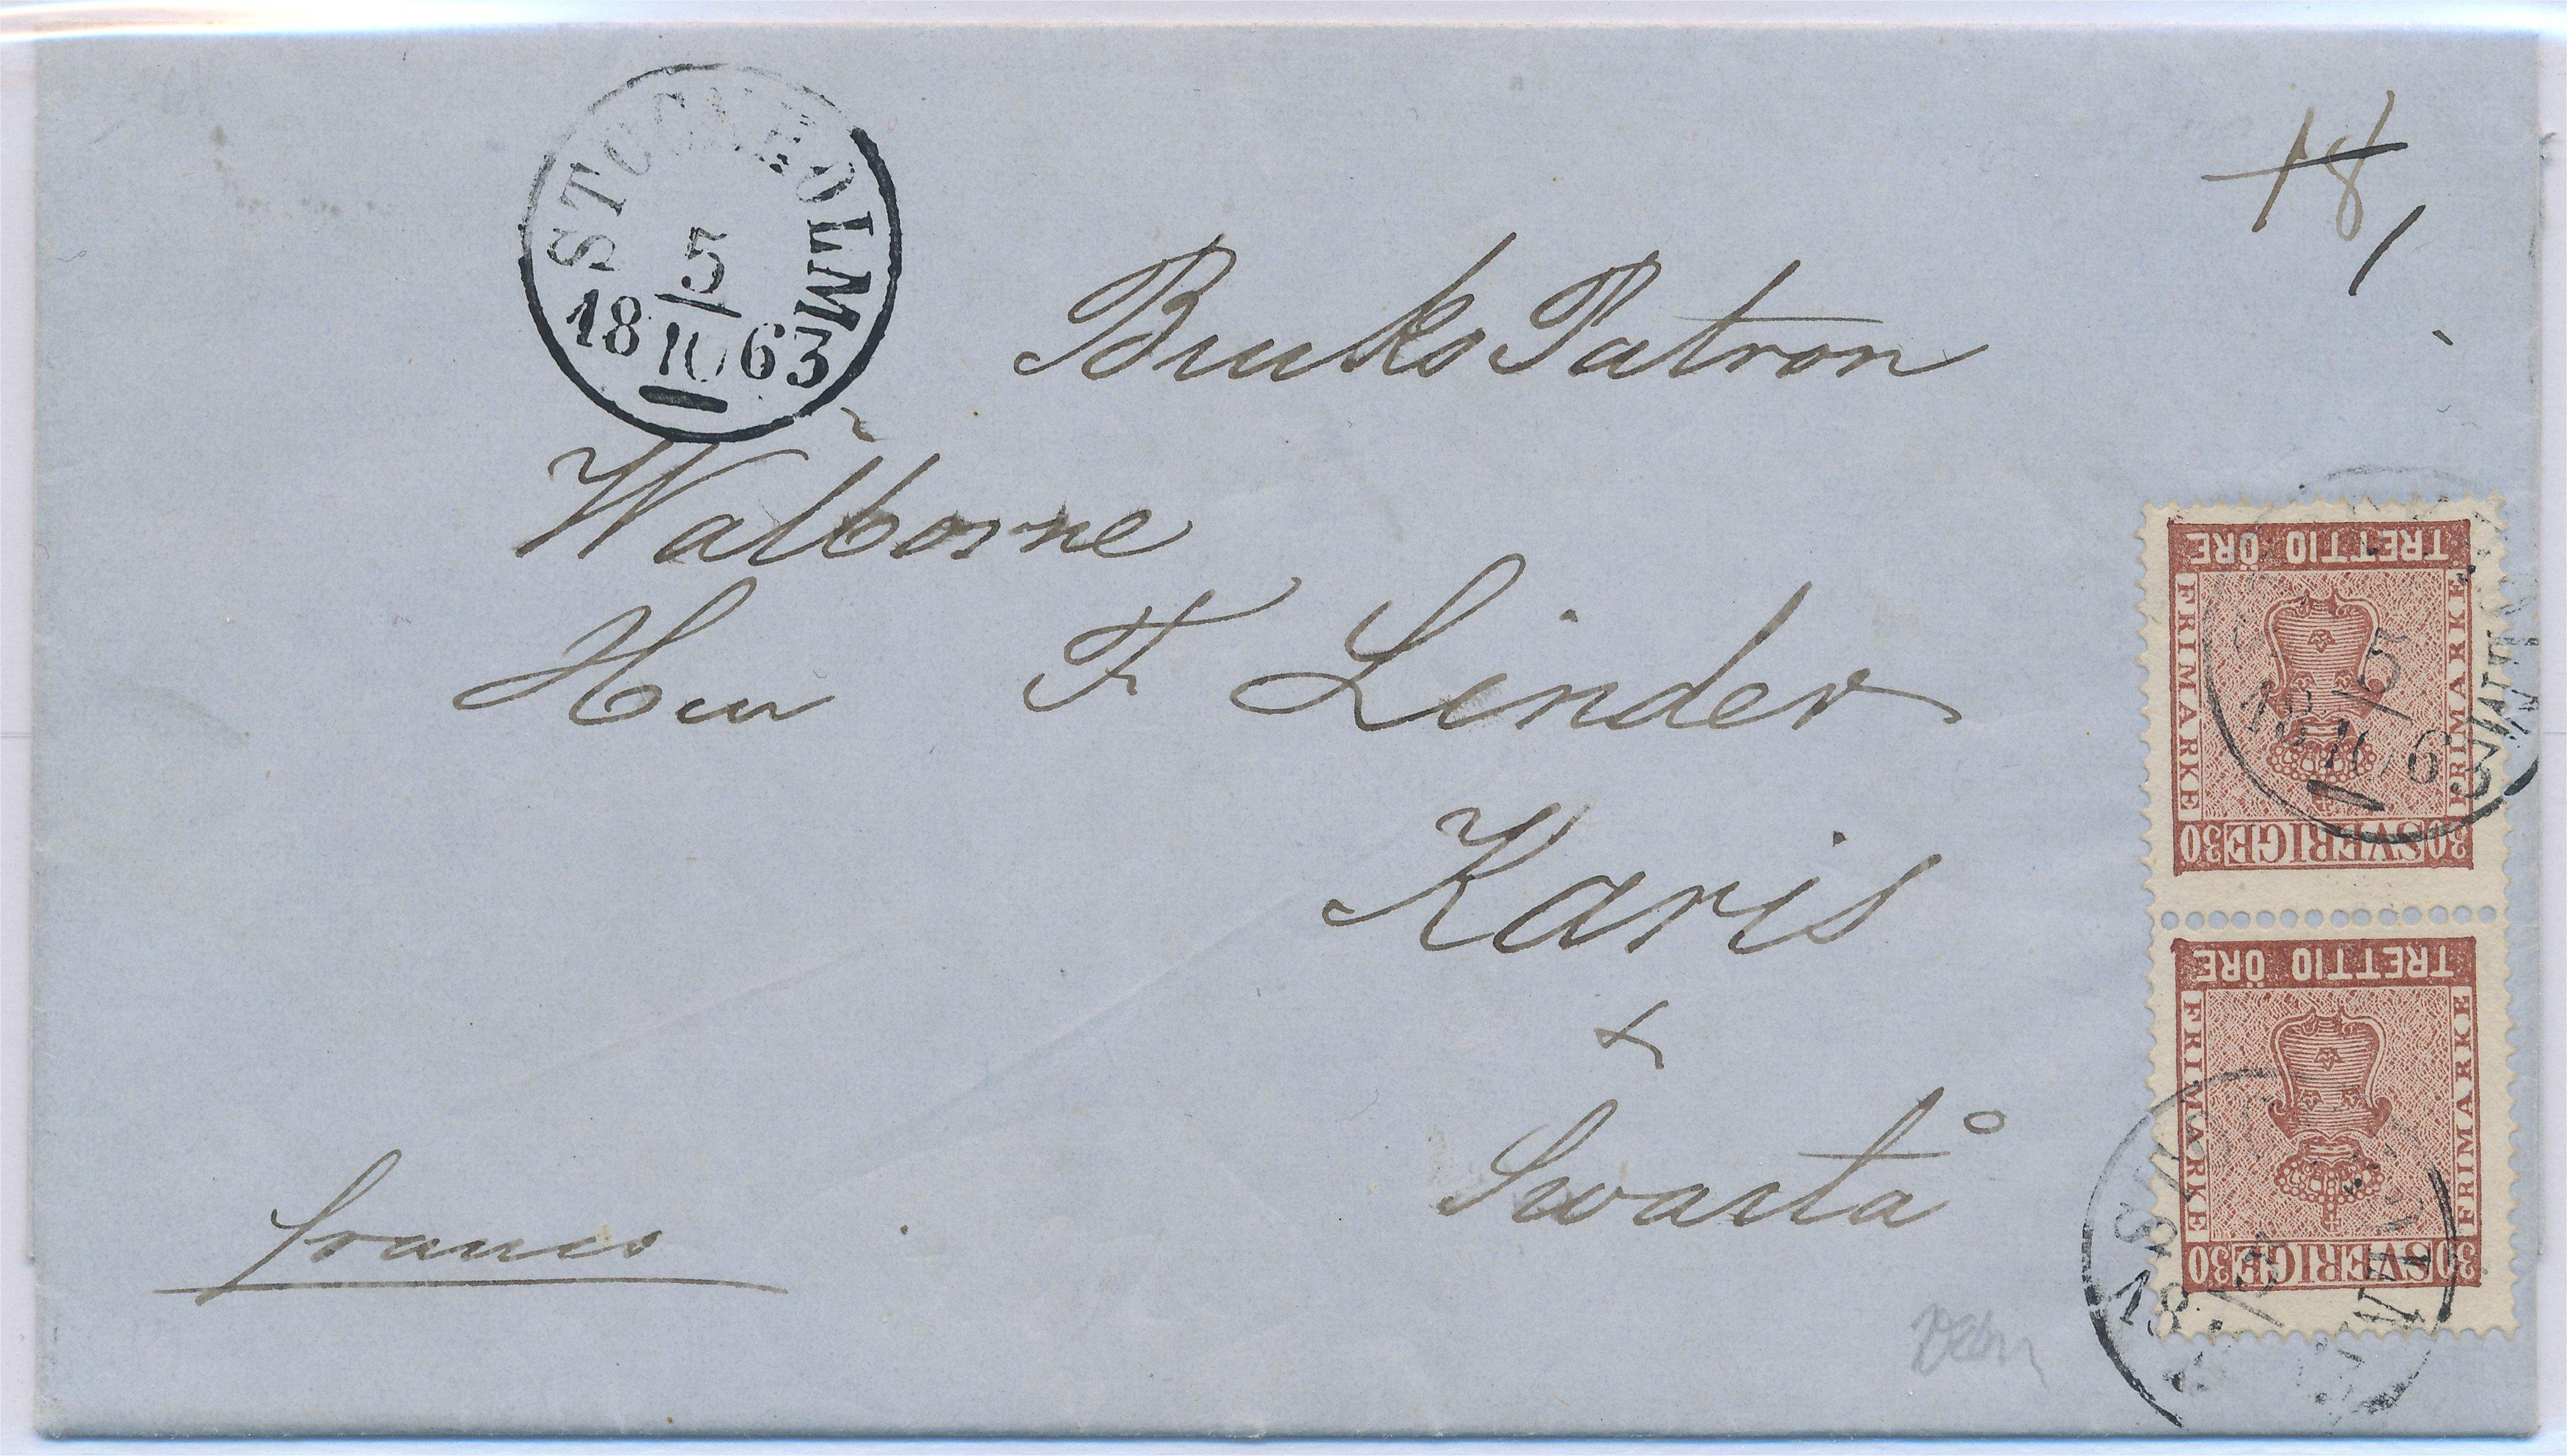 60_stockholm_5_10_1863